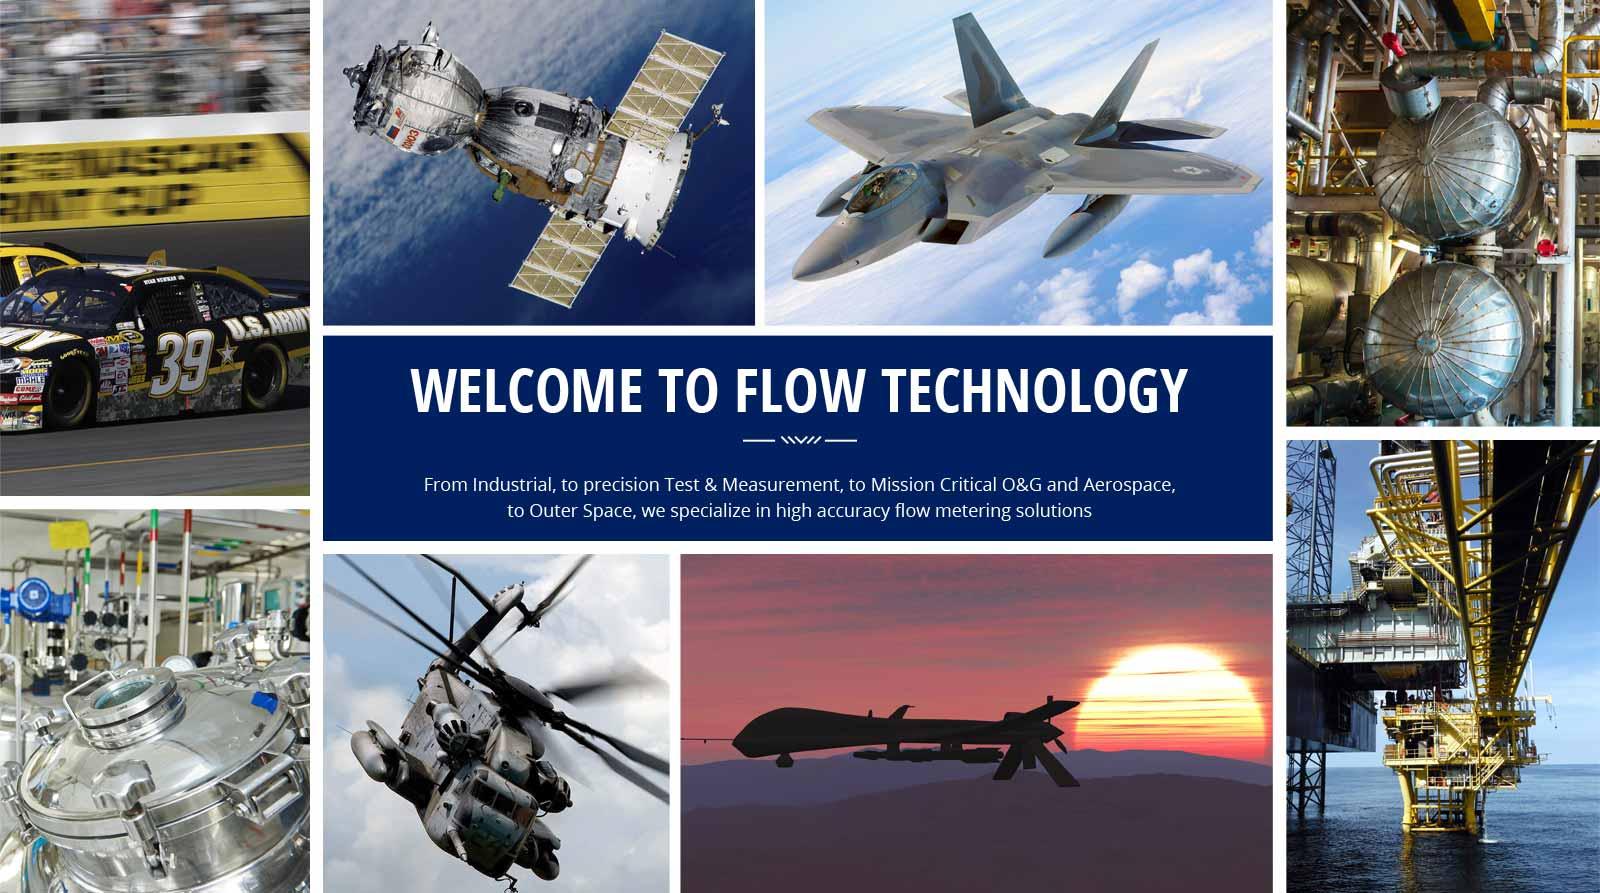 Flow Technology manufactures turbine flowmeters, positive displacement flowmeters, electromagnetic flowmeter, ultrasonic flowmeters, flowmeter calibrators, and offers repair/calibration services.